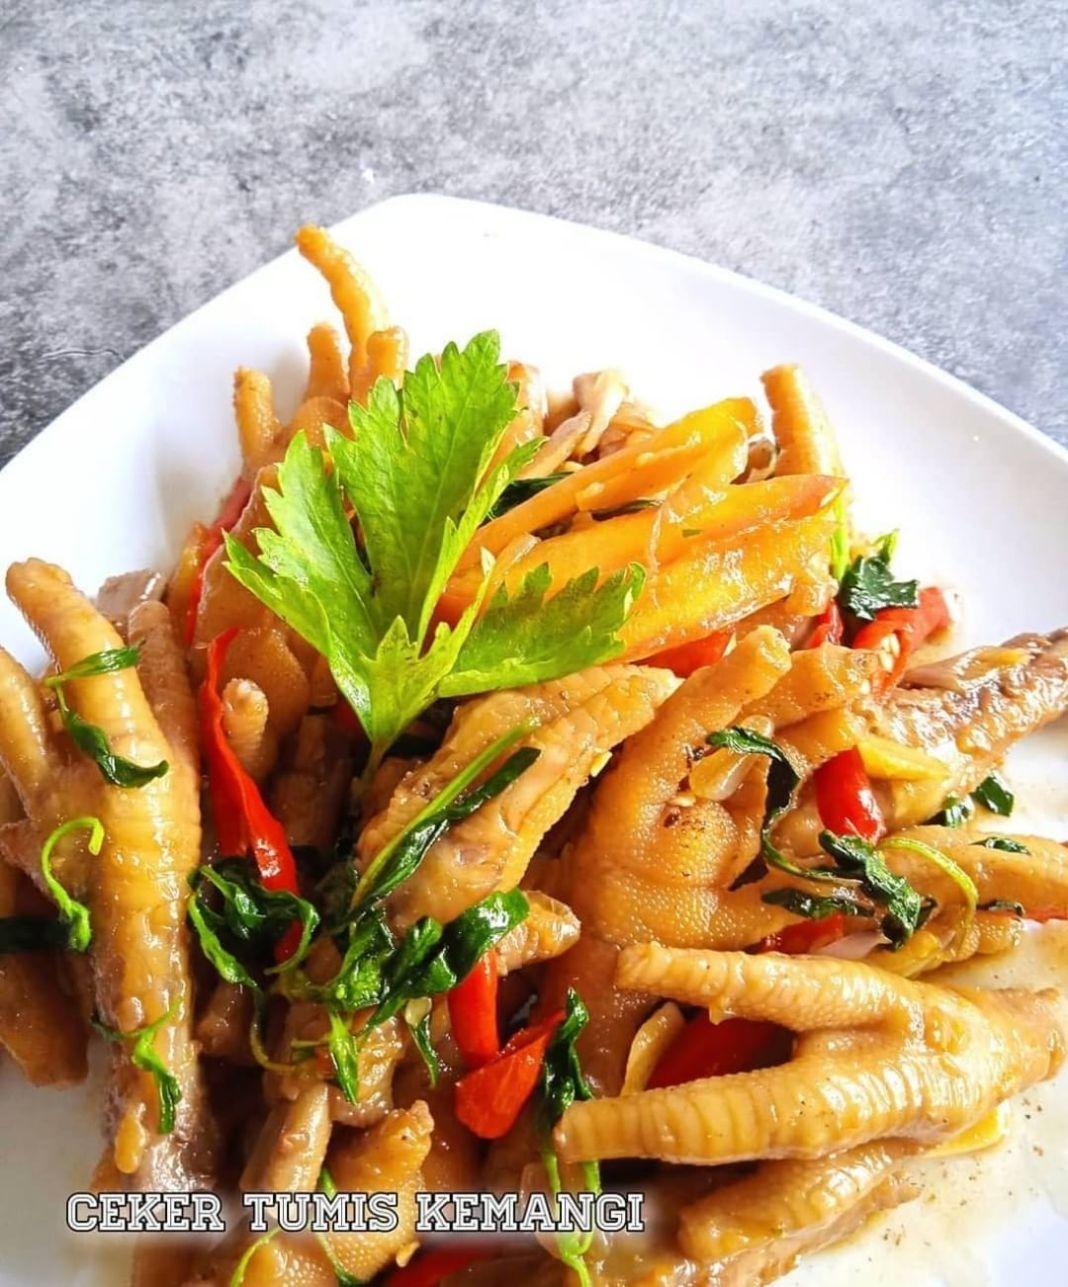 Info kuliner, CEKER AYAM siapa yg suka cekerrr????  Bahan – bahan :  3 sendok makan minyak goreng  5 siung ba…